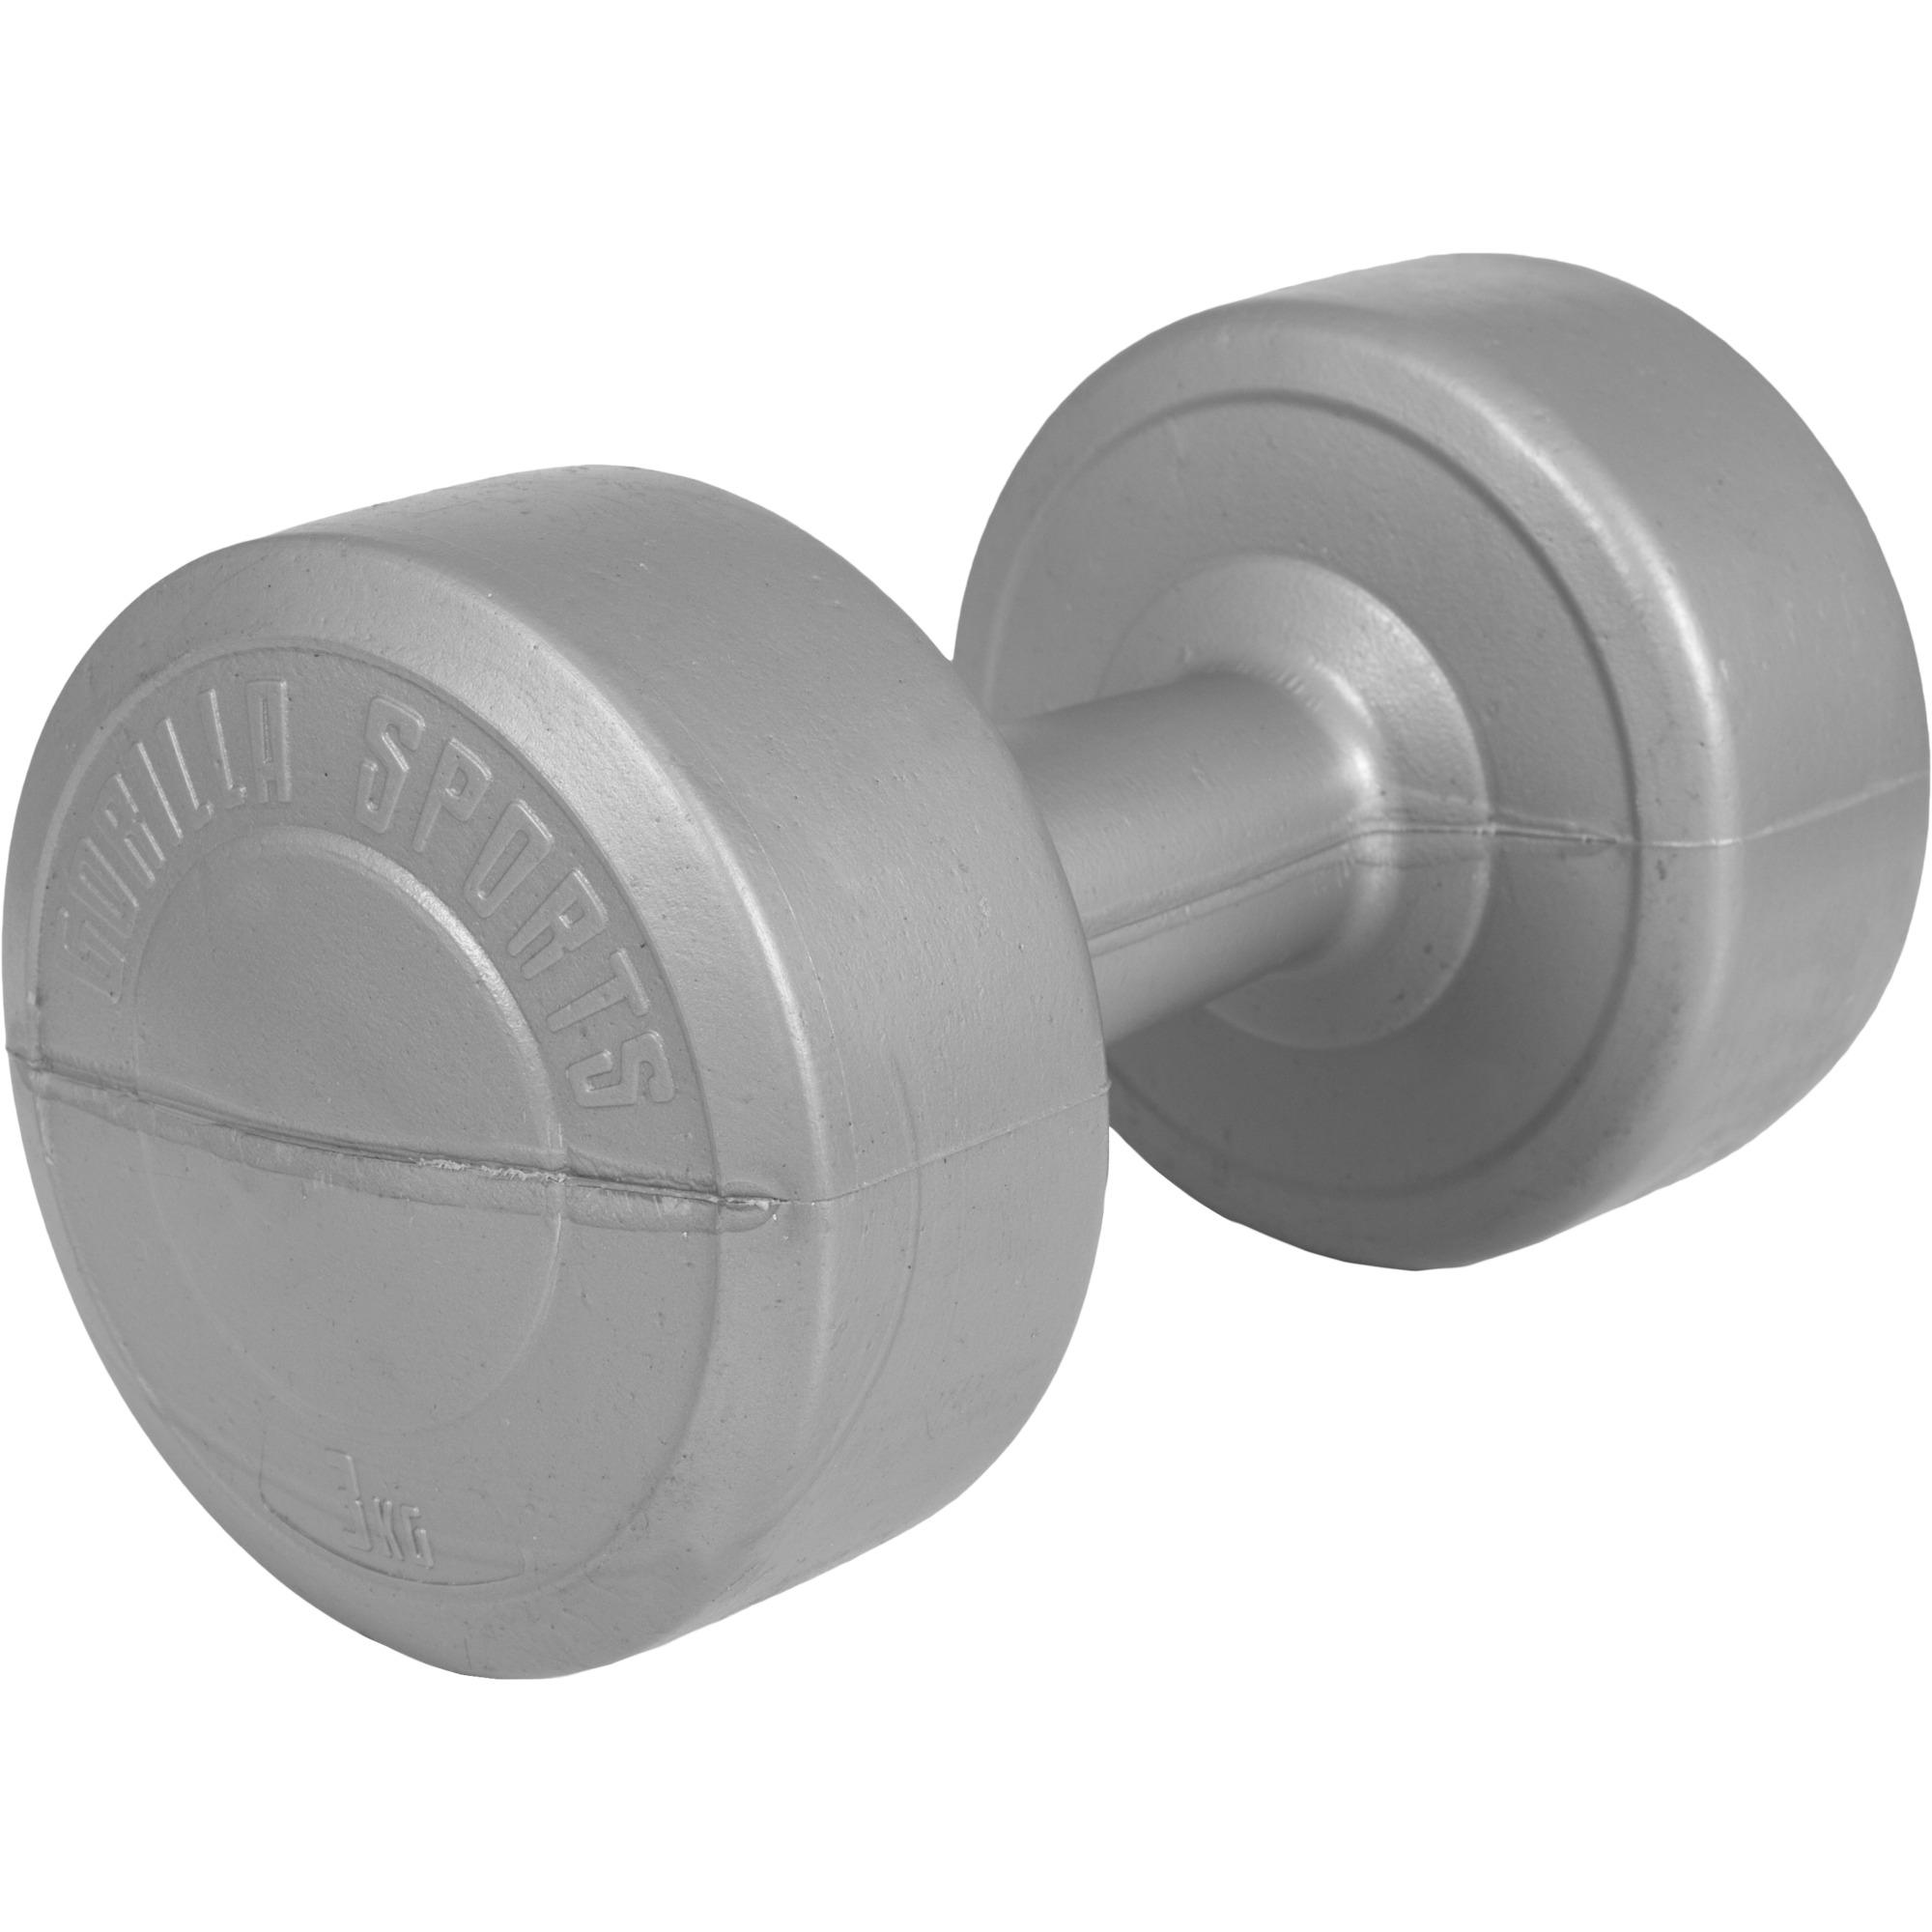 Gymnastikhantel Aerobic Kunststoff Silber 3 kg